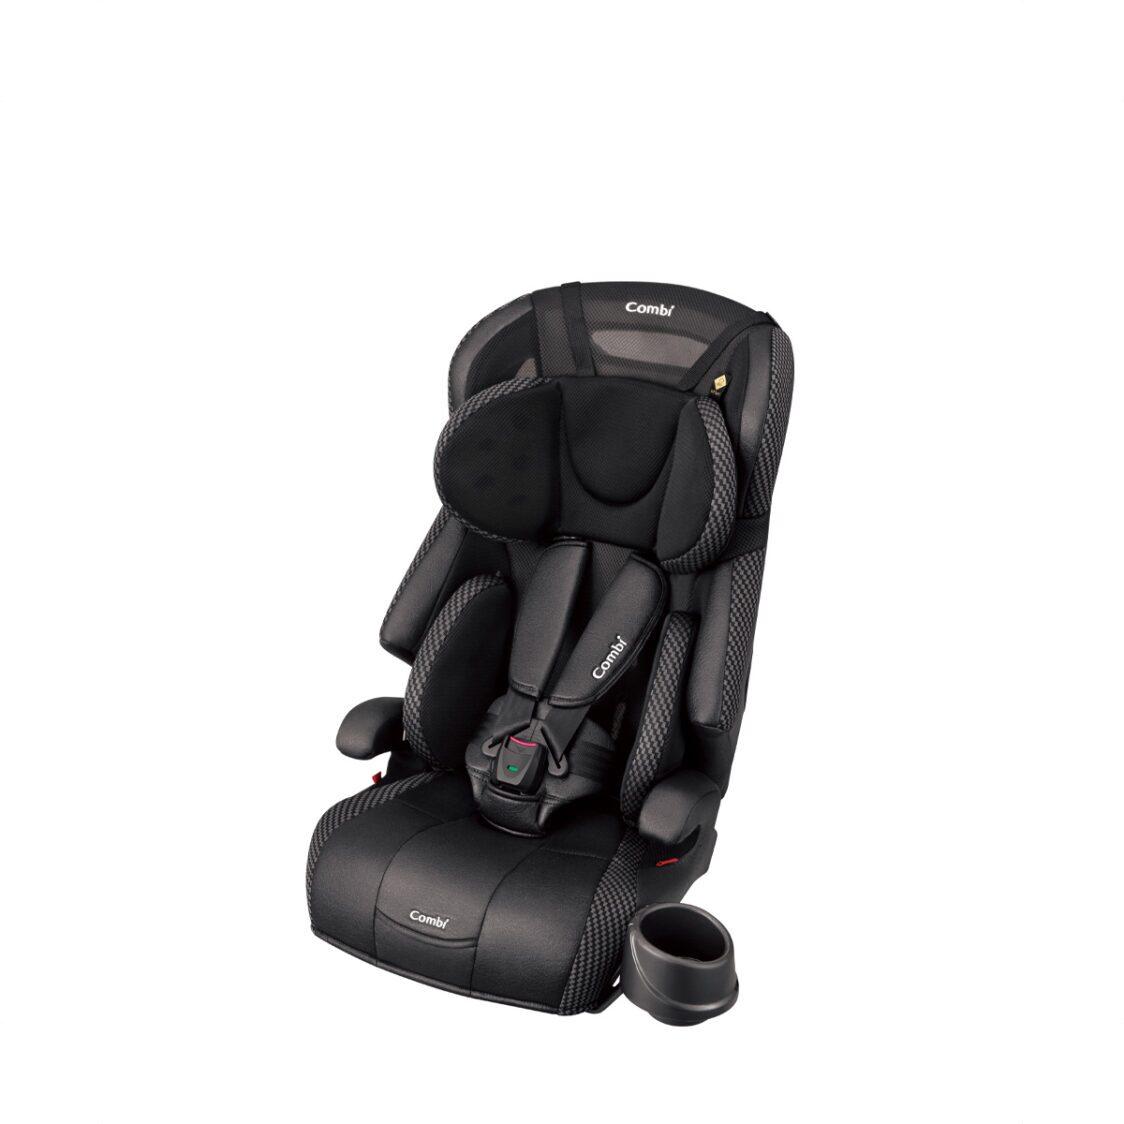 Combi Joytrip EG Dark Black Car Seat 111 Years Old 53KG